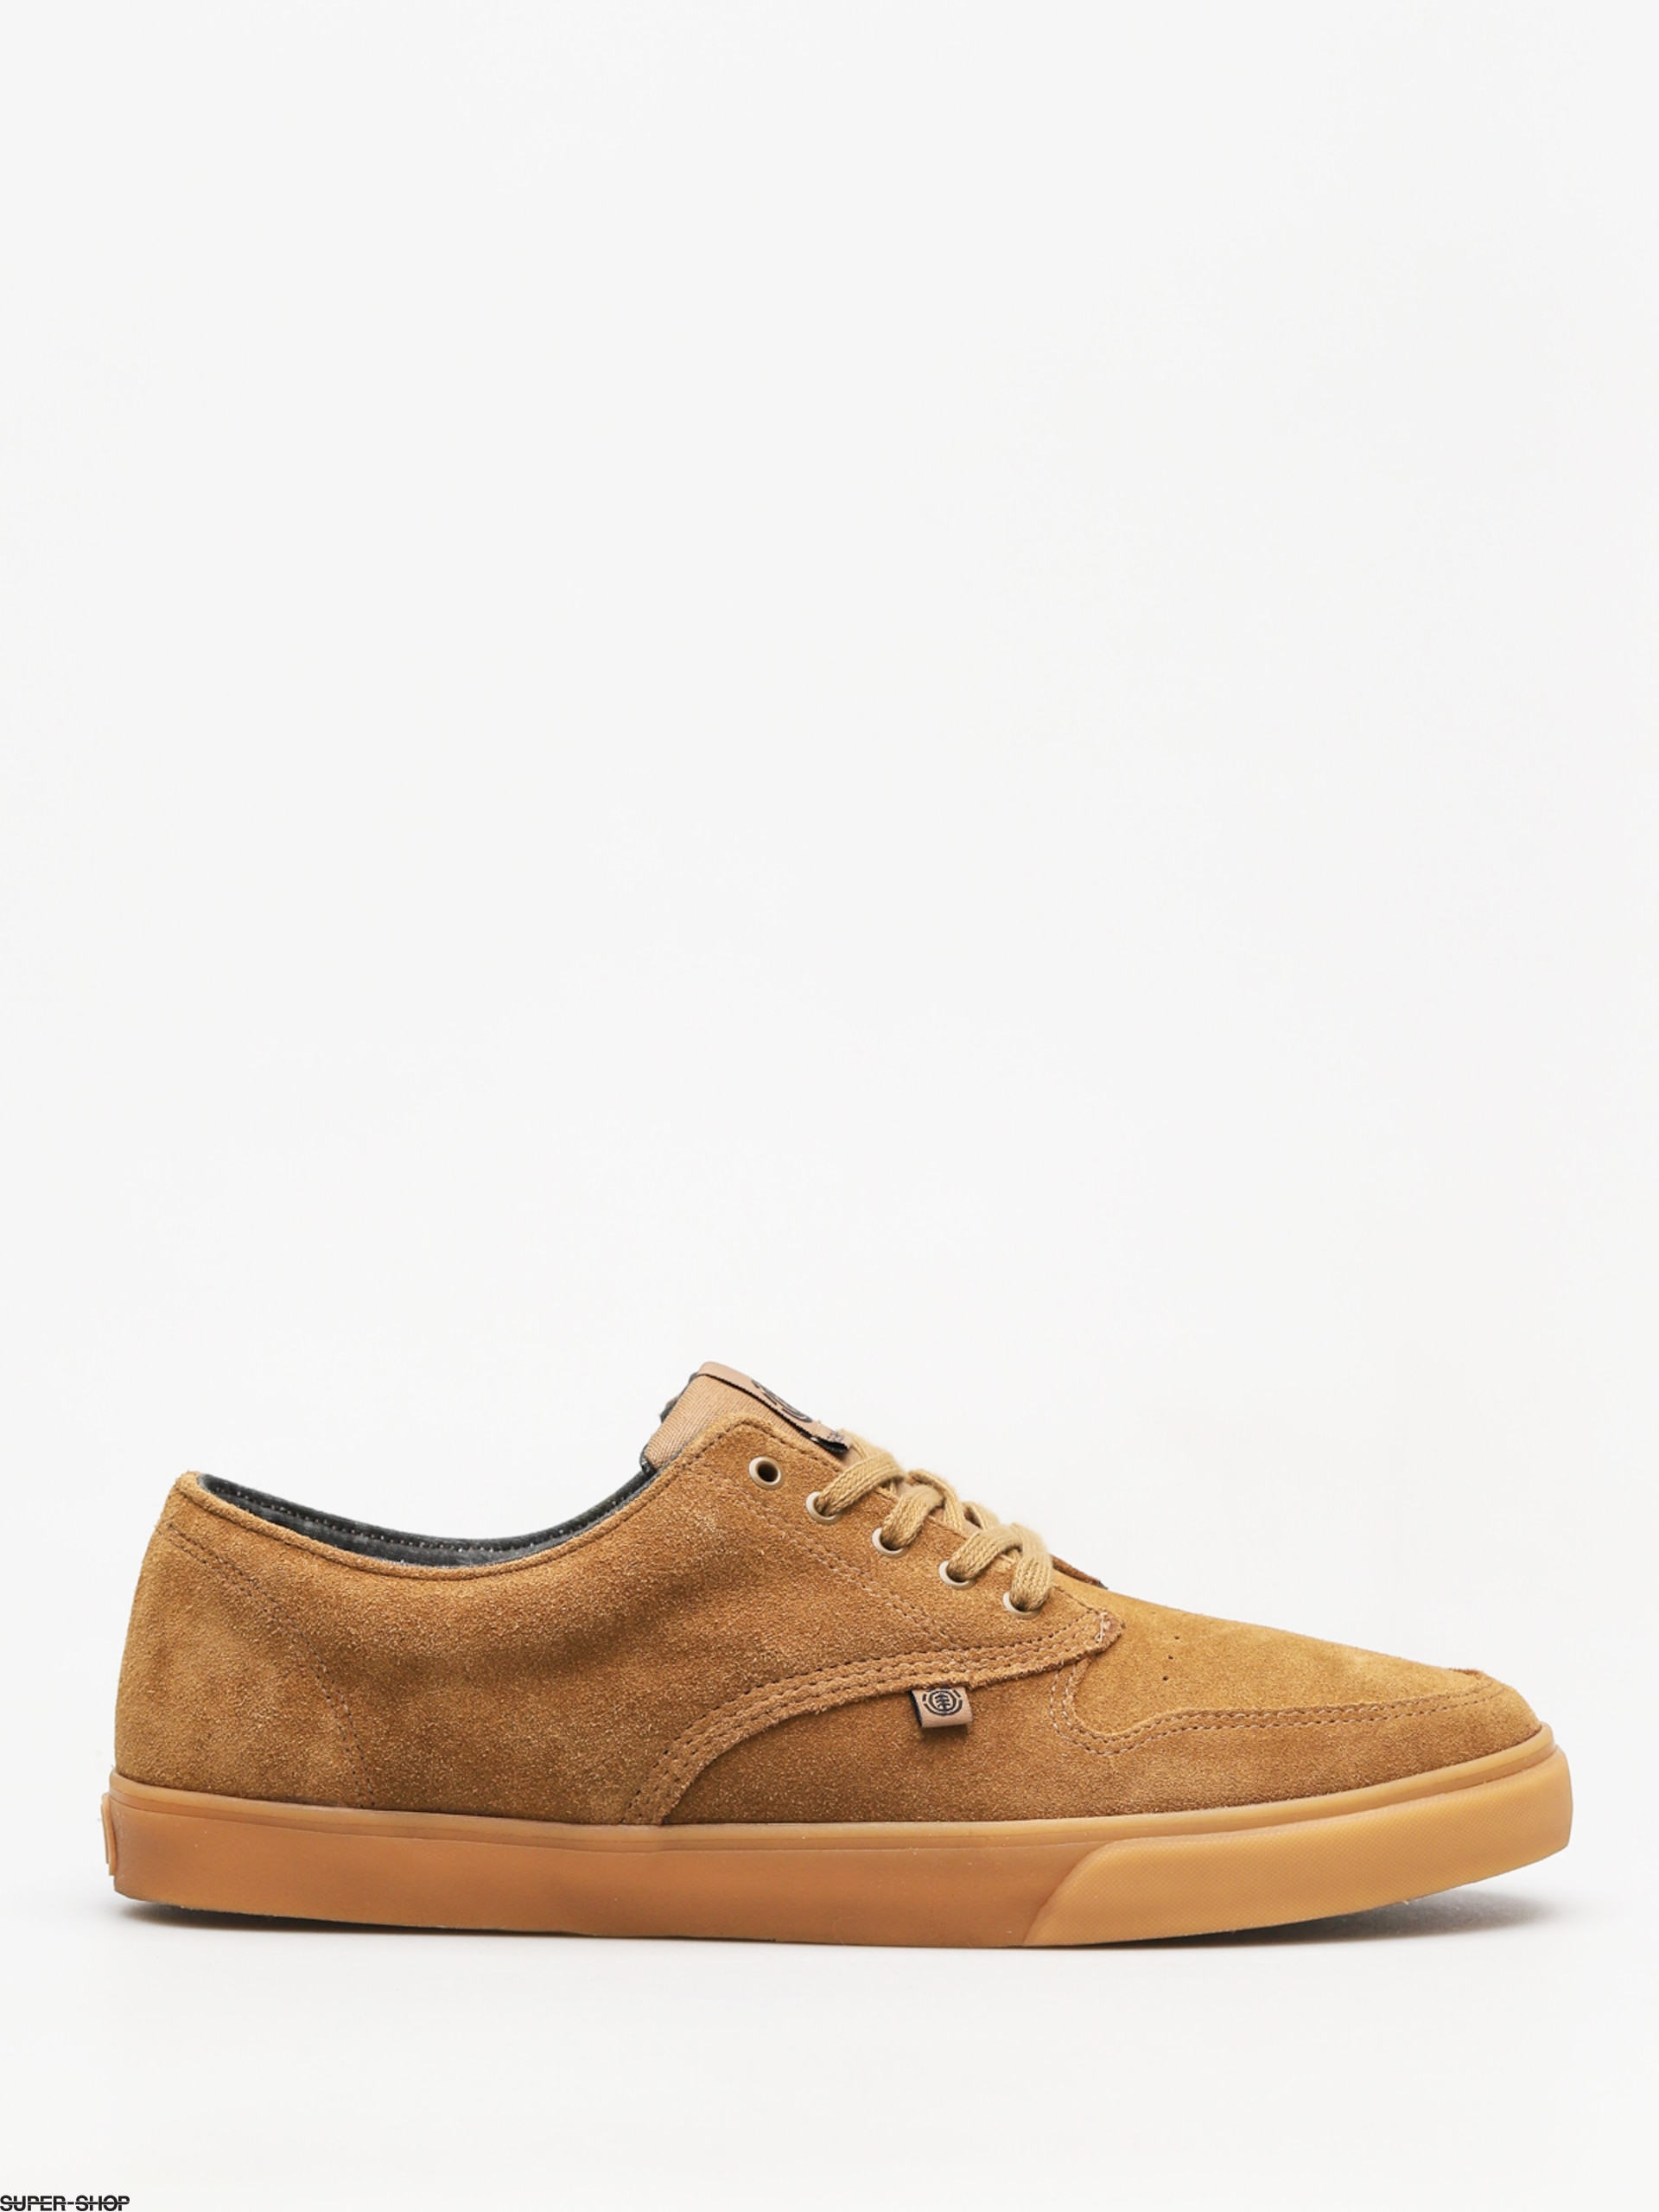 Shoes Breen Element 4pweqzzhnx C3 Gum Topaz pUGSzqMV